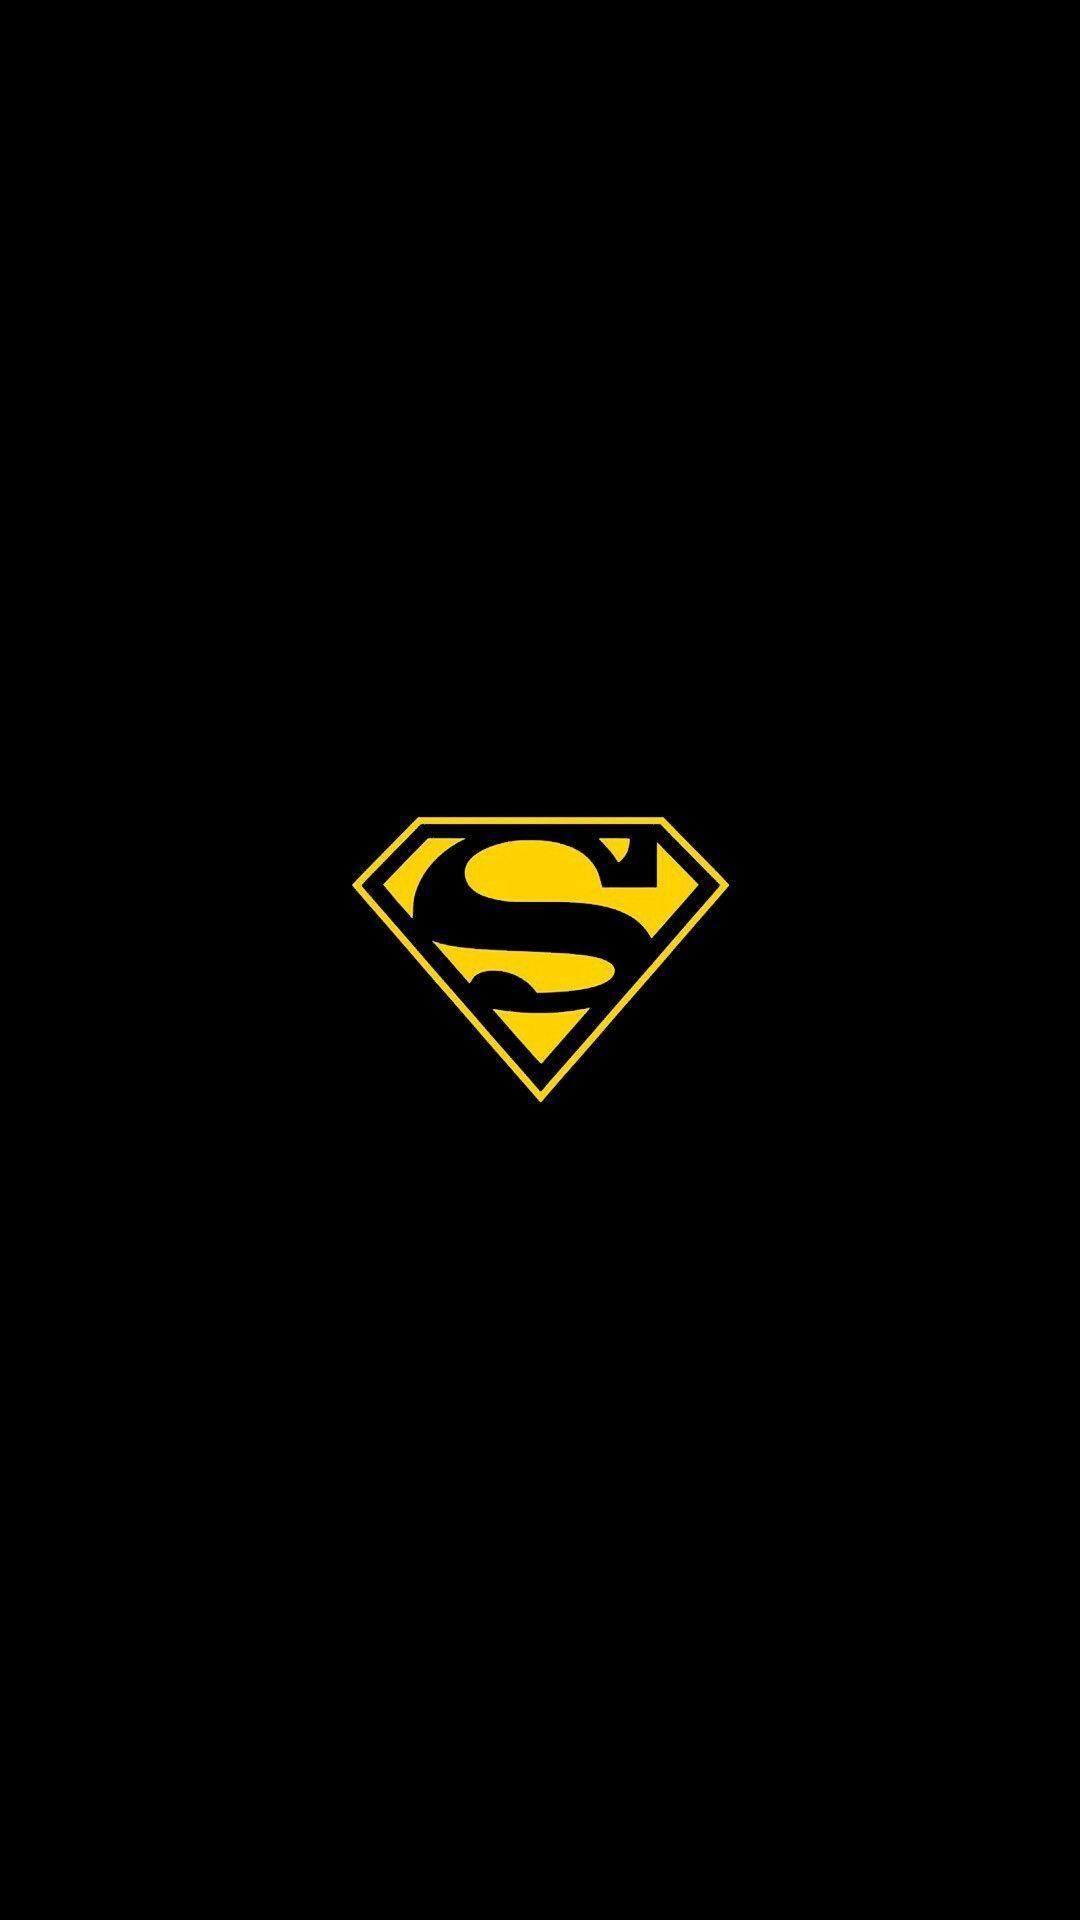 Superman Logo iPhone Wallpaper